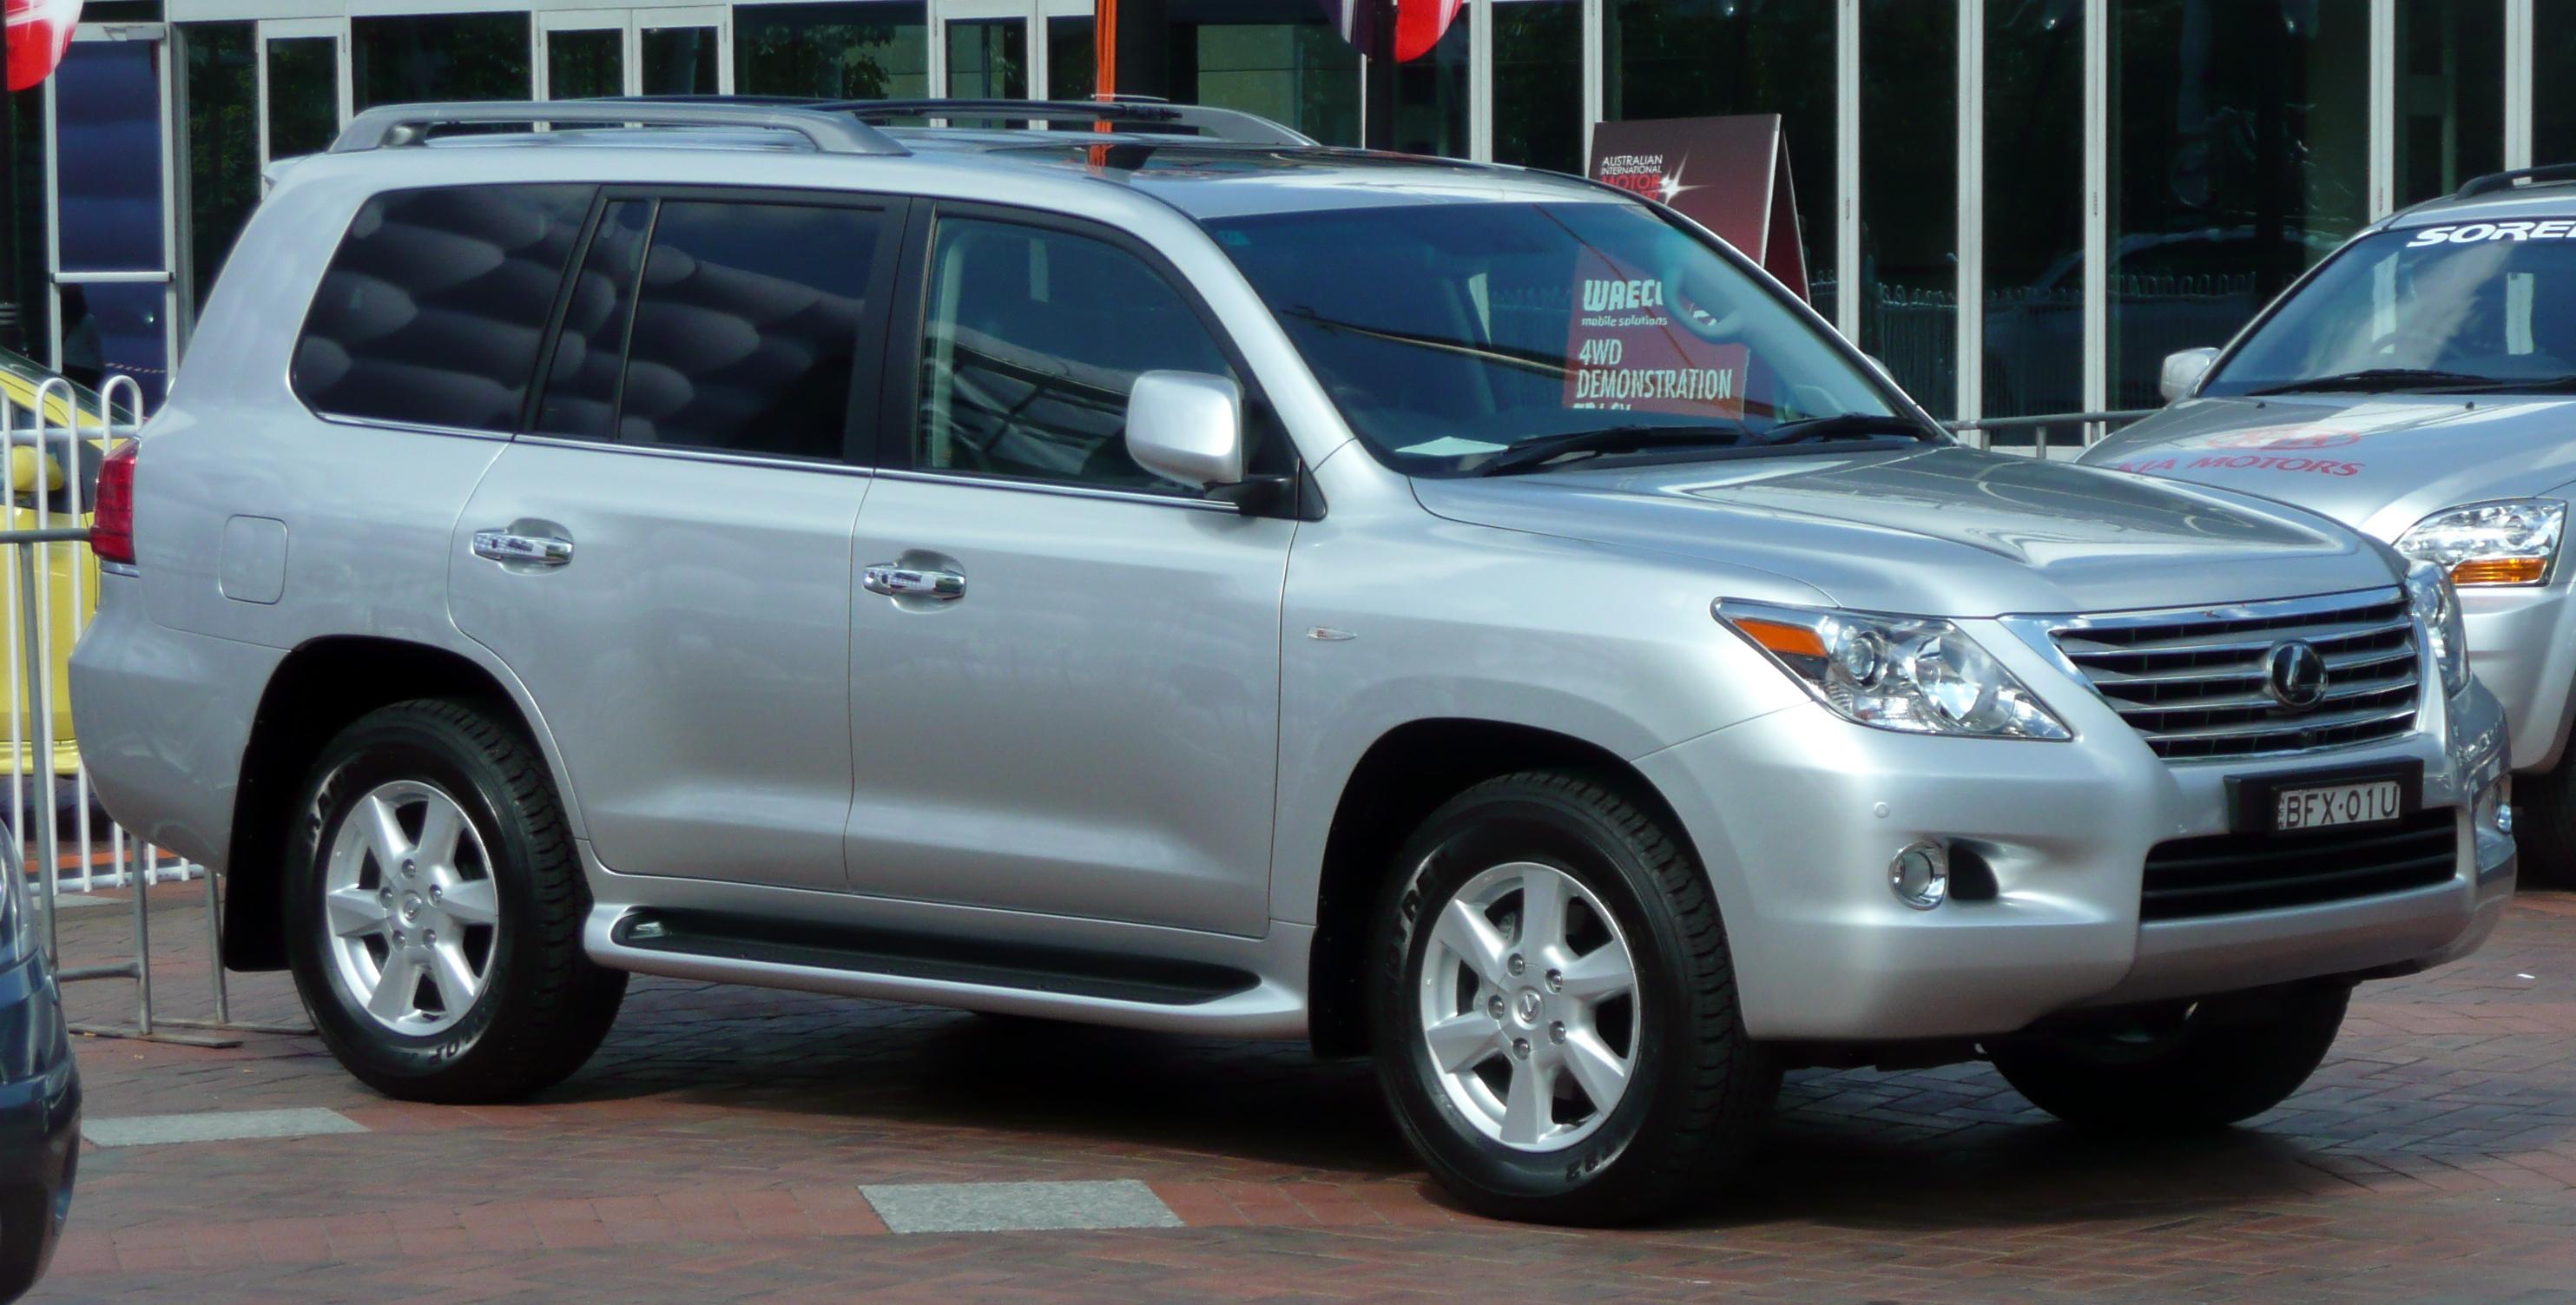 https://upload.wikimedia.org/wikipedia/commons/e/ea/2008_Lexus_LX_570_%28URJ201R%29_Prestige_wagon_04.jpg